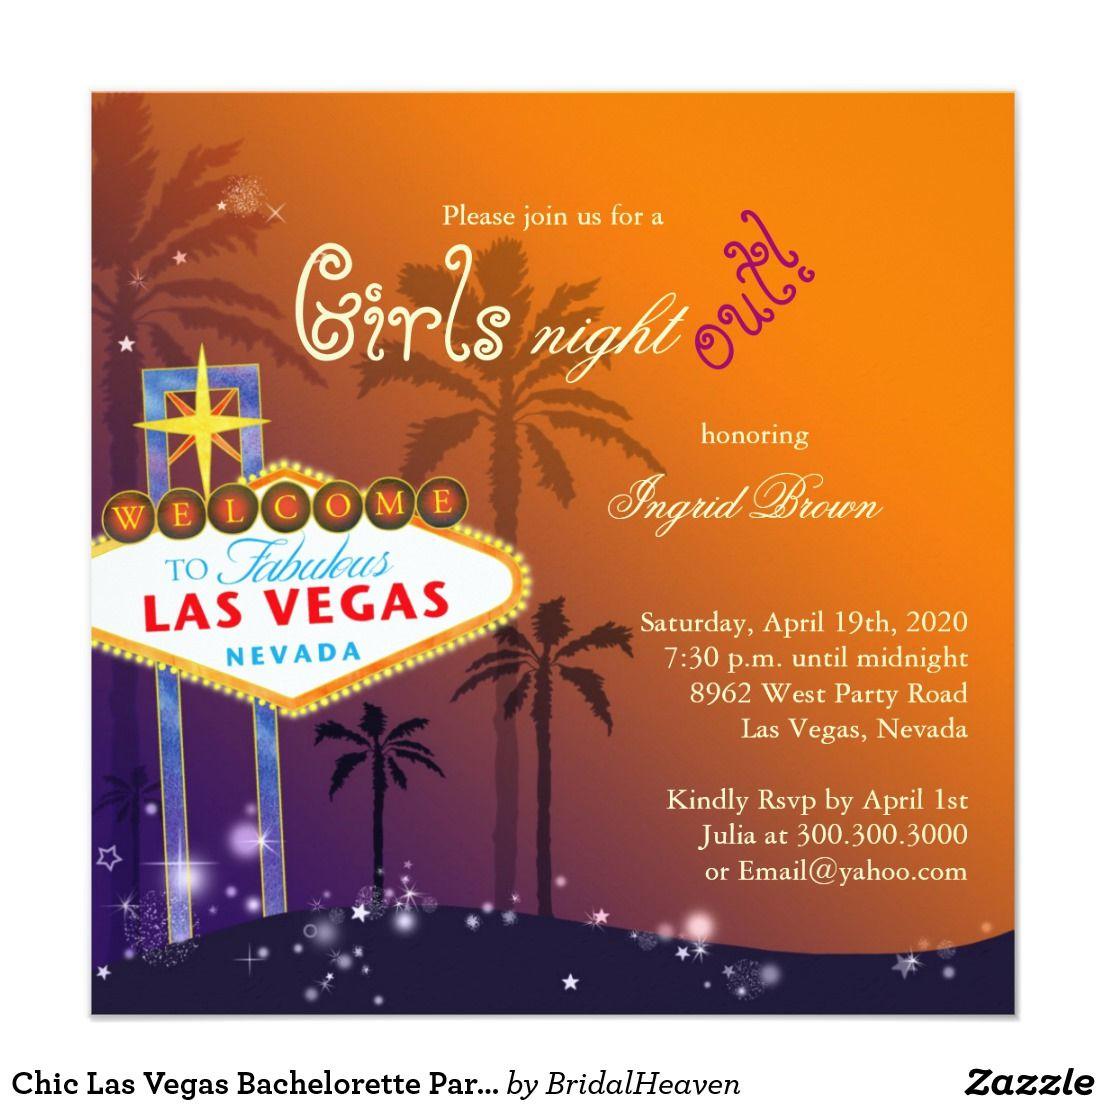 Chic Las Vegas Bachelorette Party Invitation | Fabulous Las Vegas ...